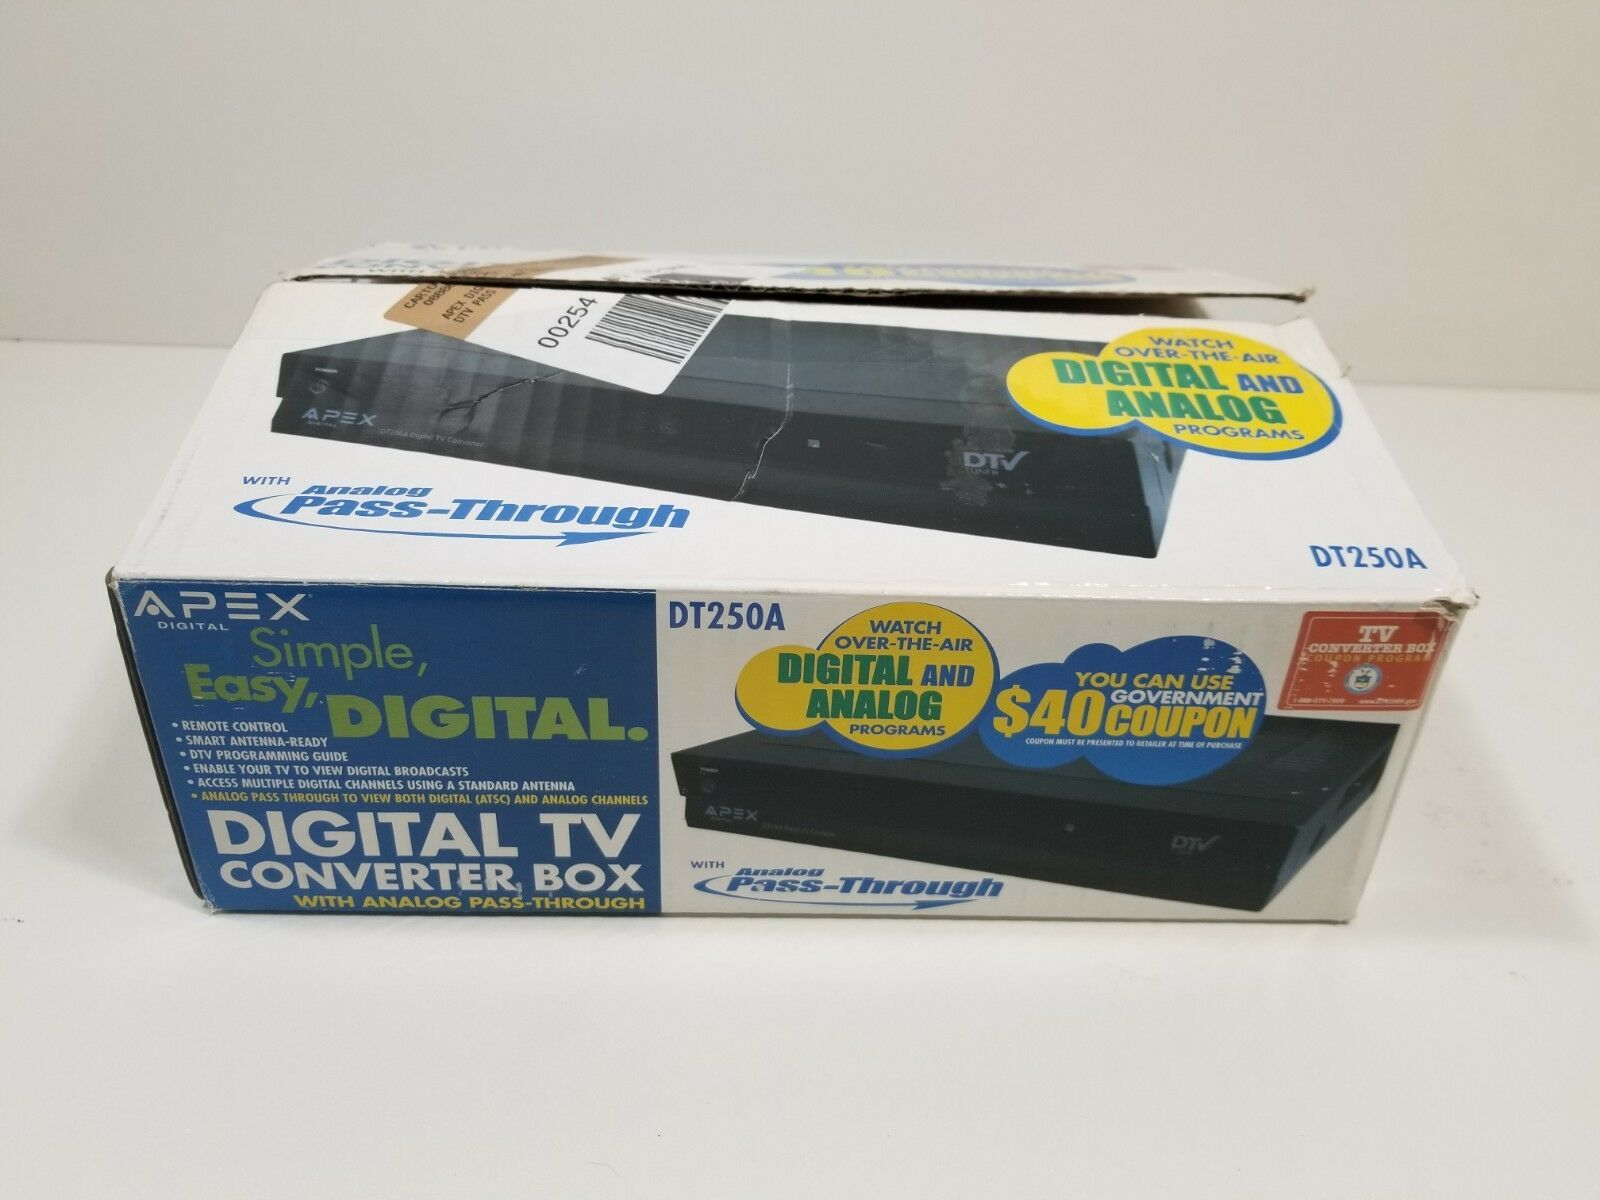 APEX DT250A Digital TV converter box image 5